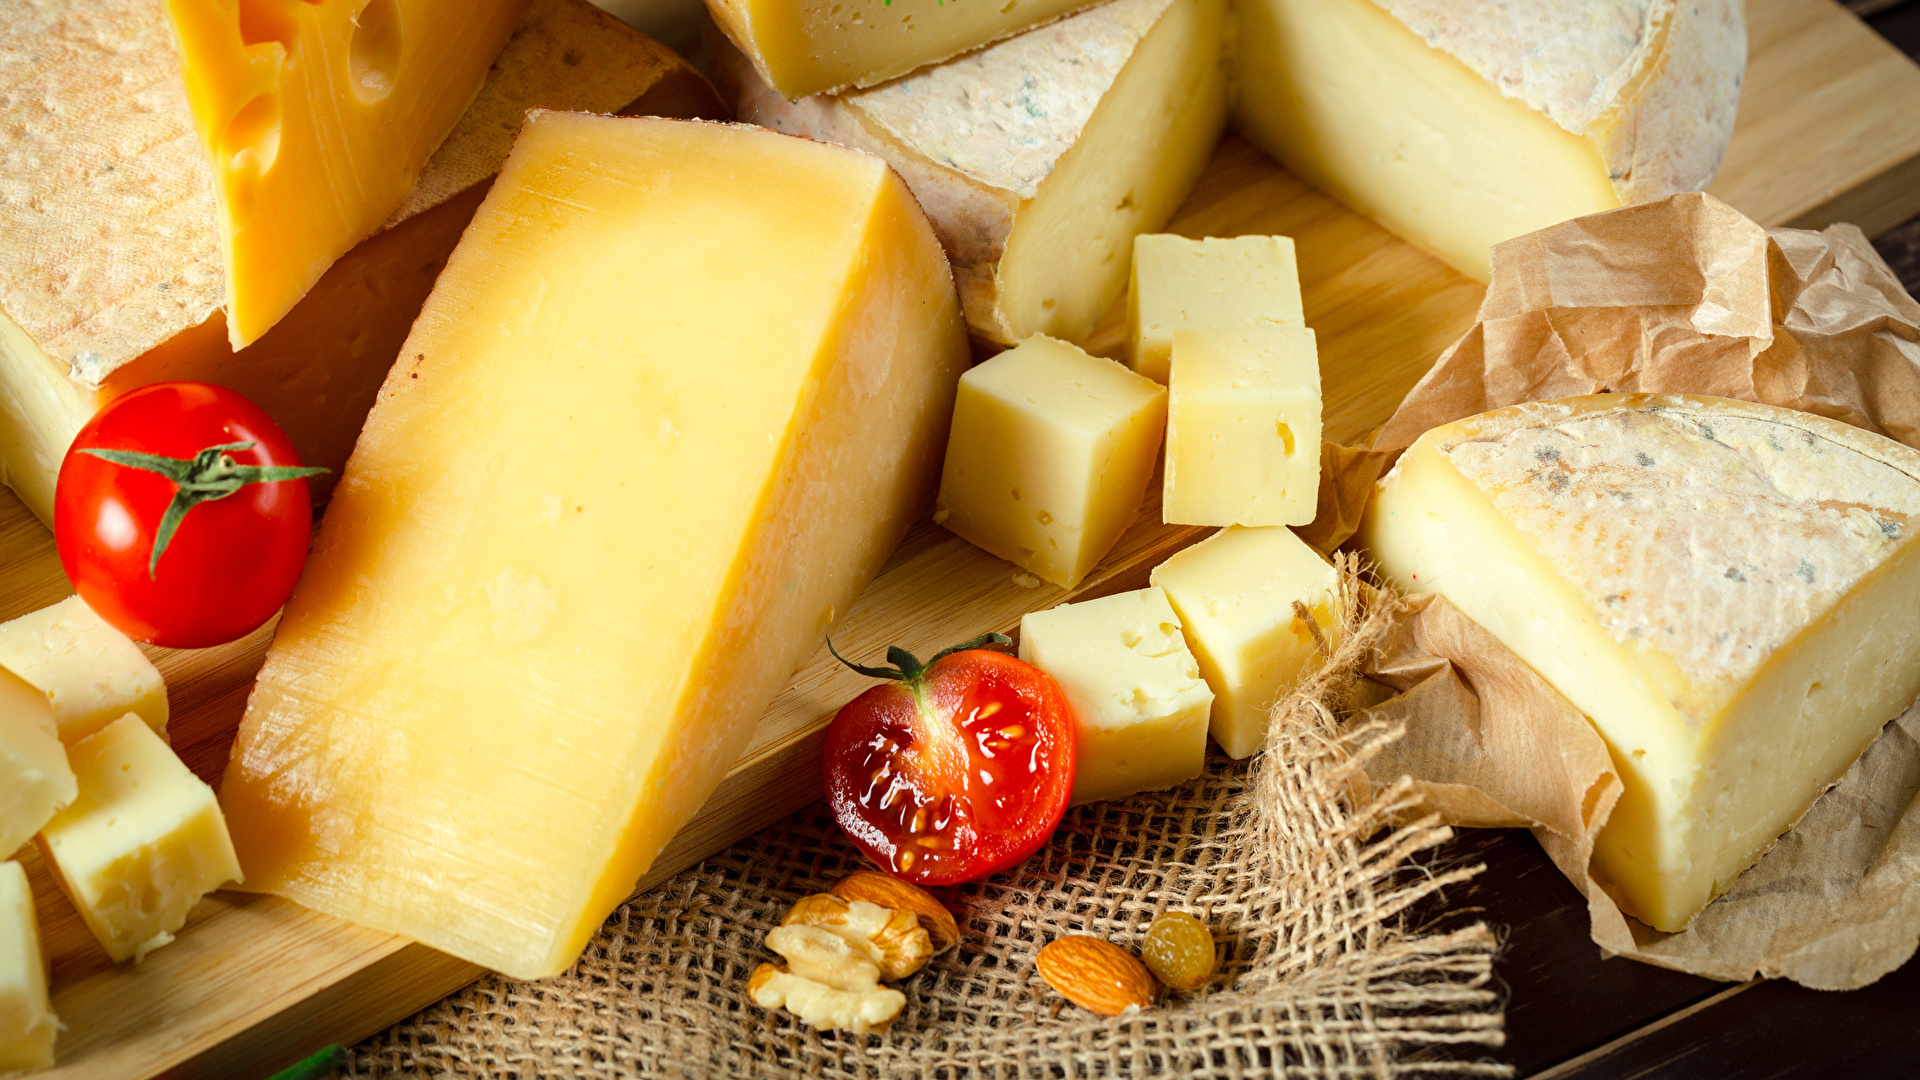 Fabricante de quesos